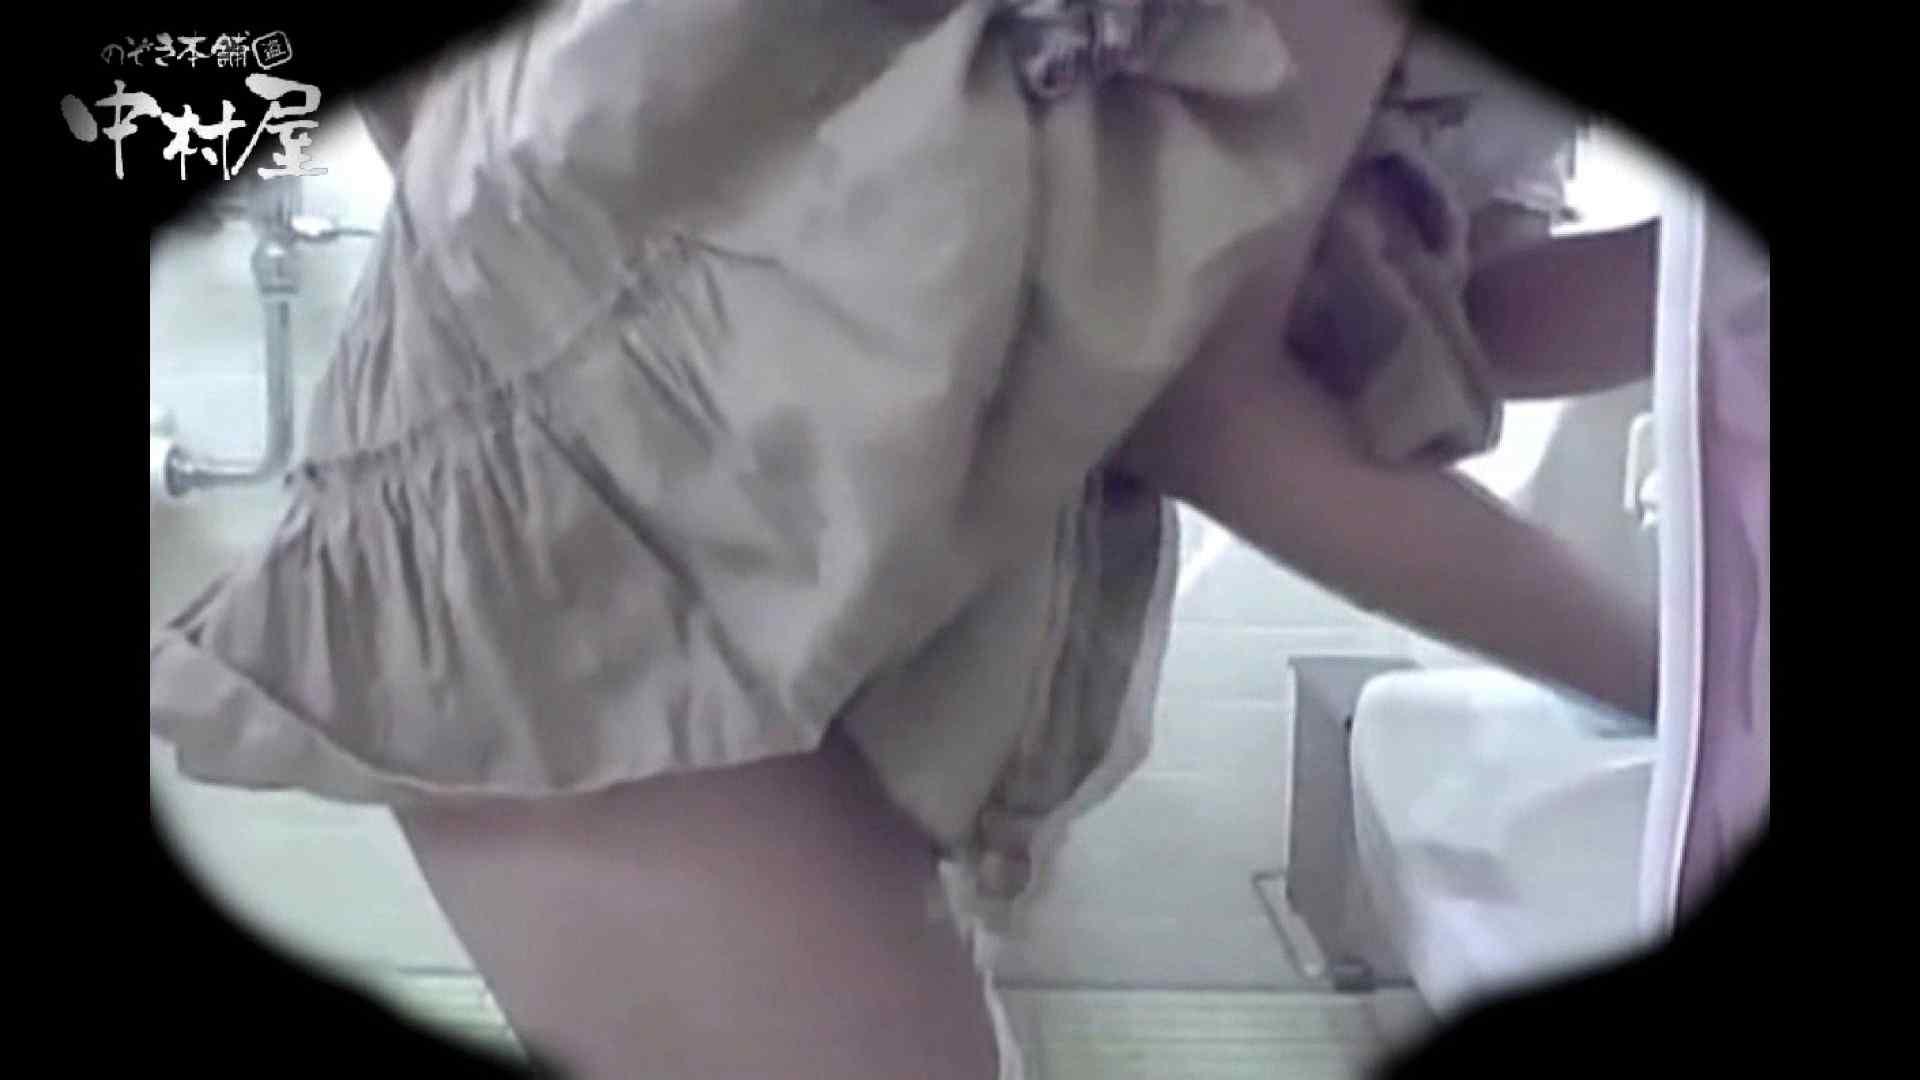 teen galトイレ覗き紙がナイ編‼vol.09 0   0  75連発 43